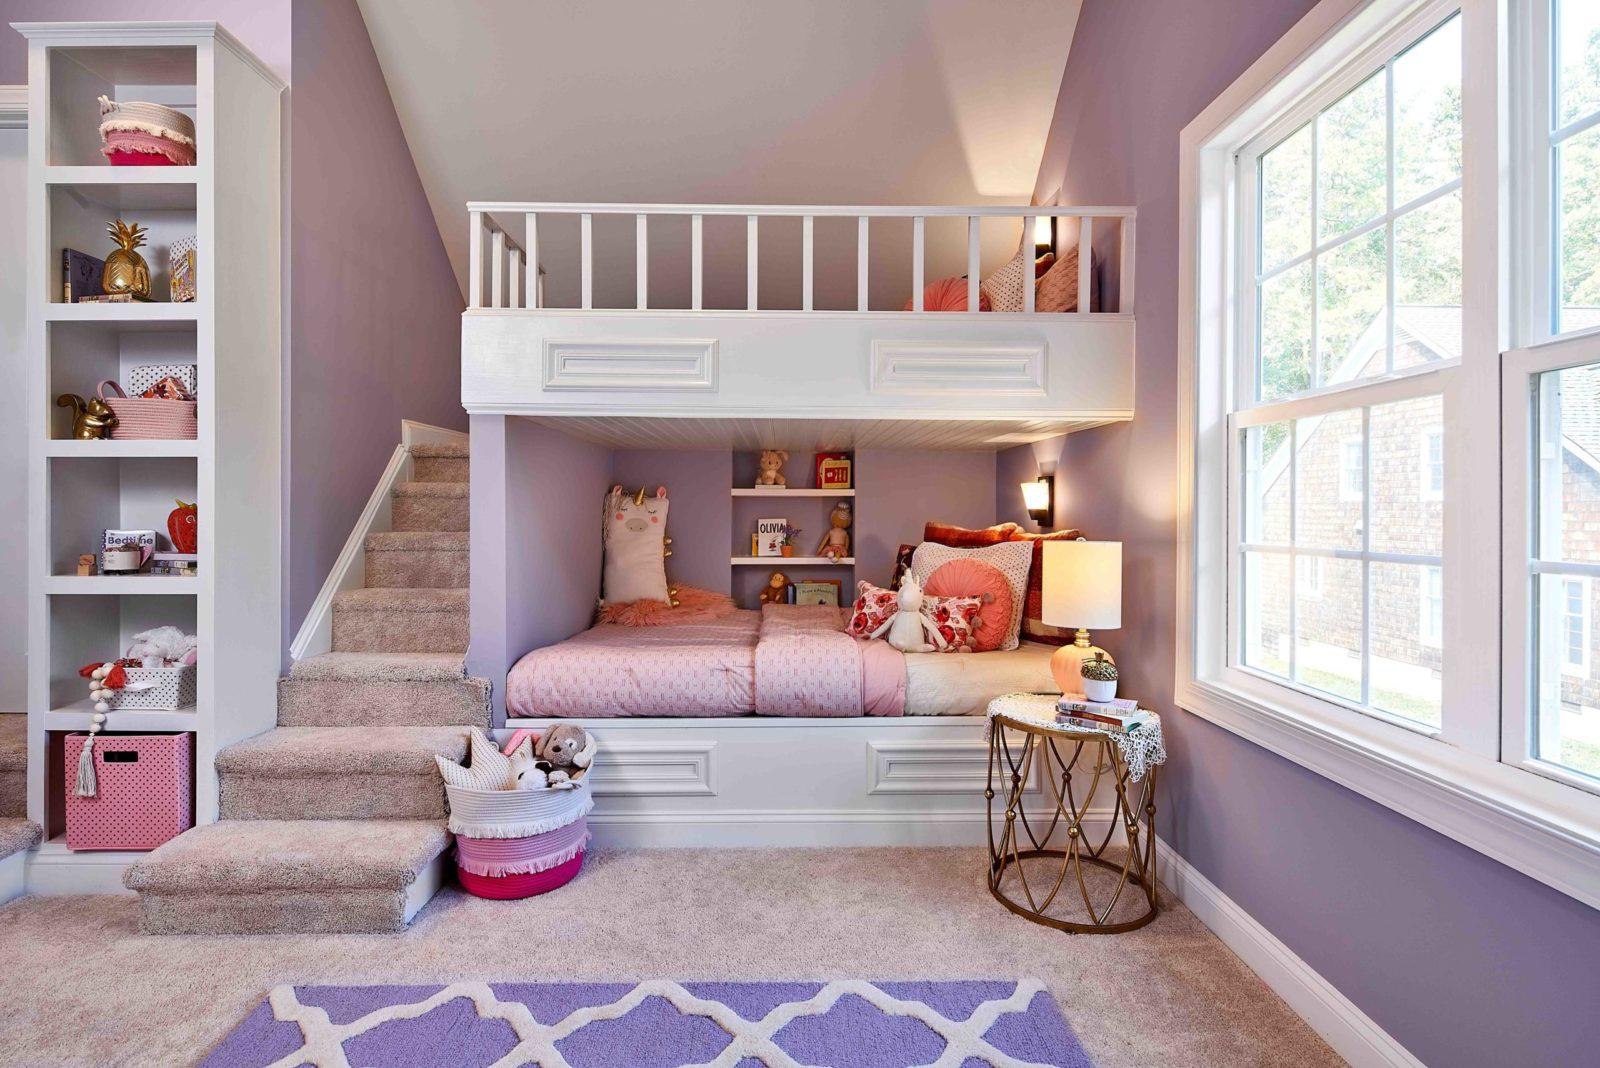 bedroom-conversion-revision-design-built-in-bunk-beds